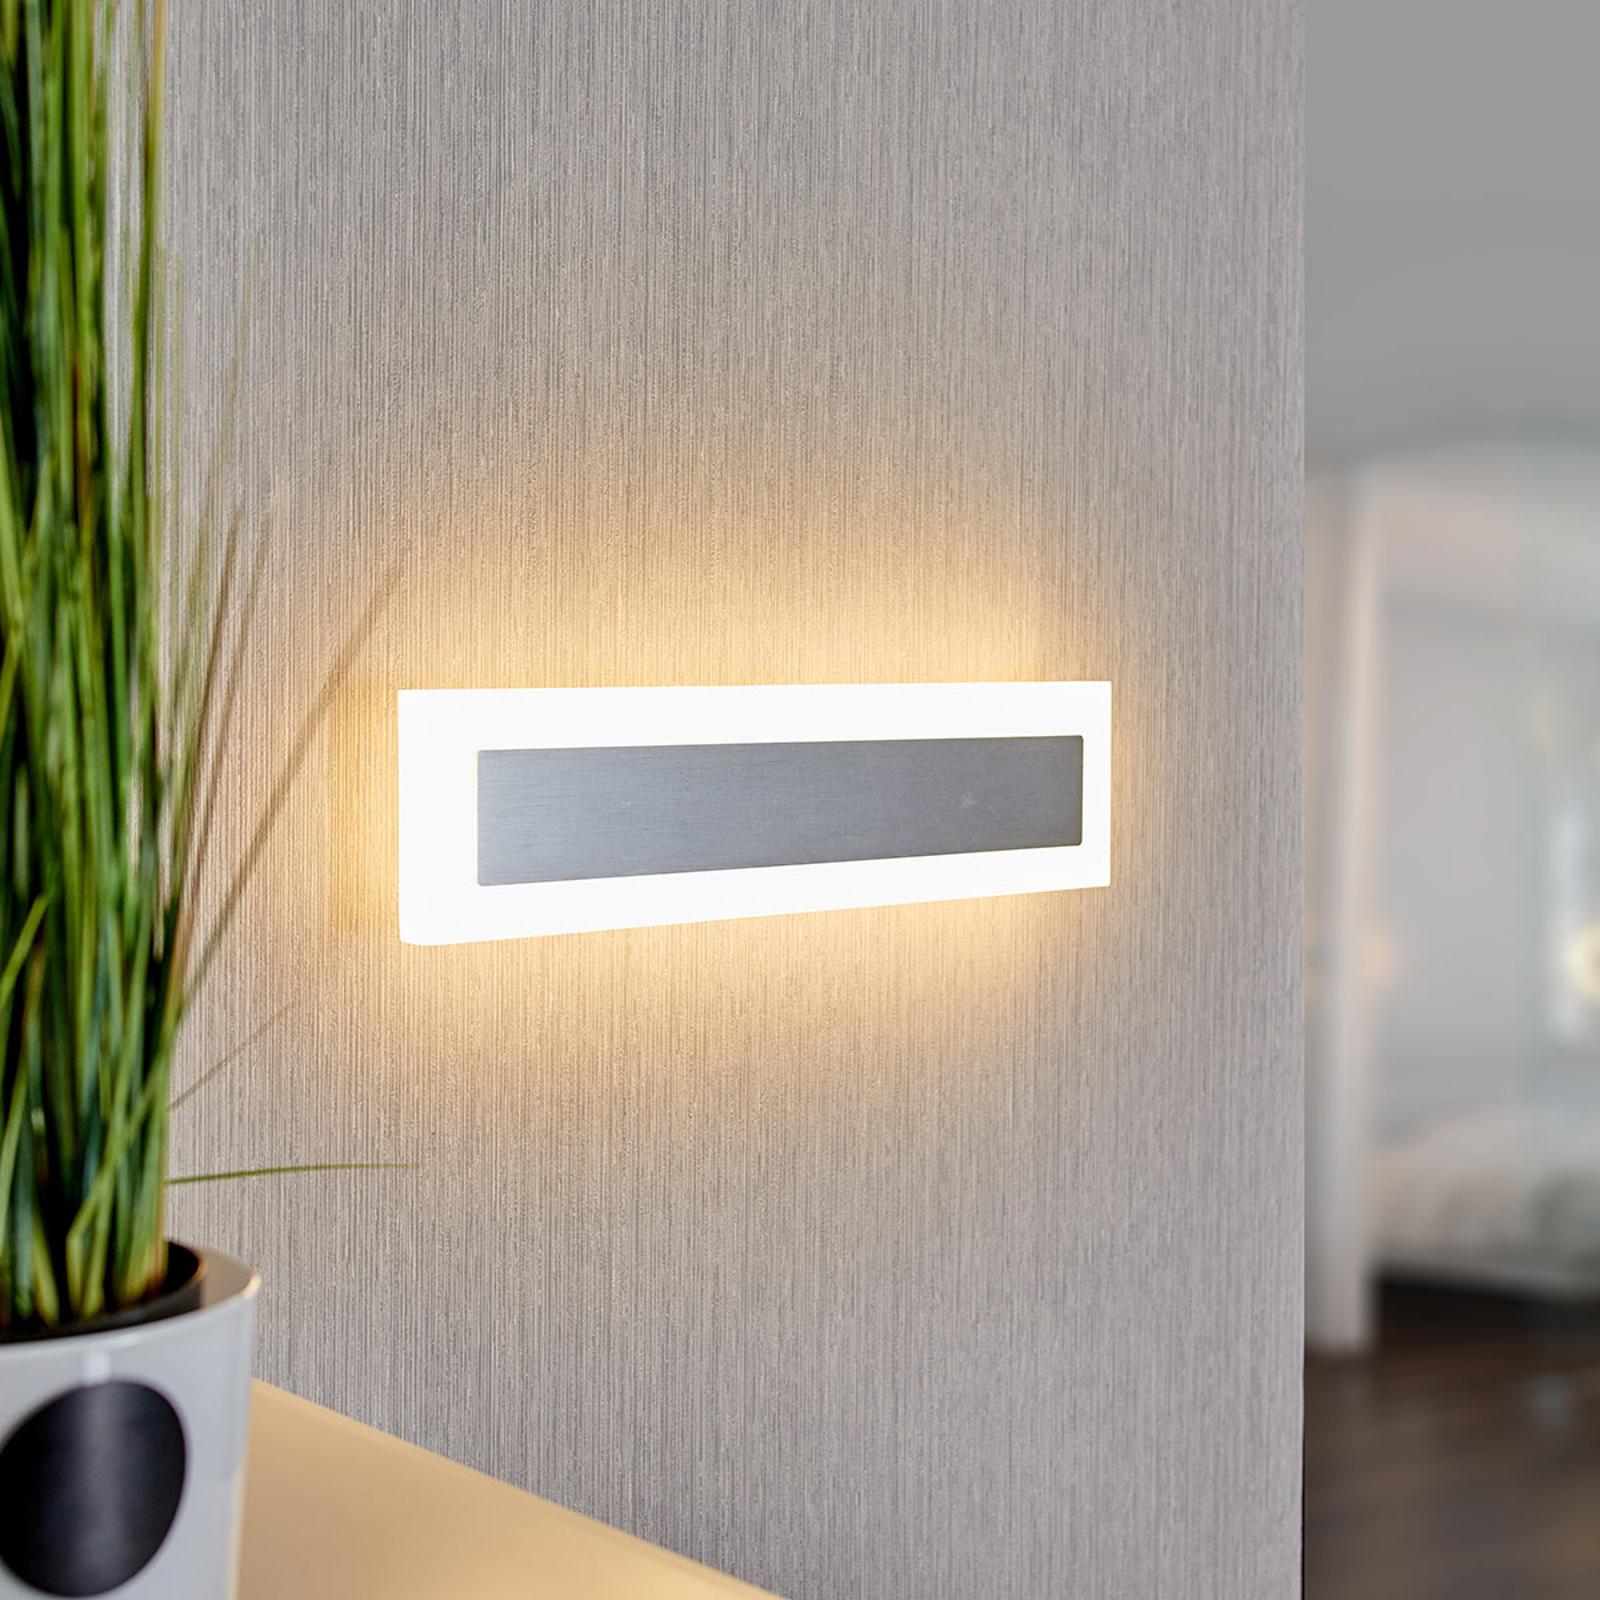 Rechthoekige LED wandlamp Marle